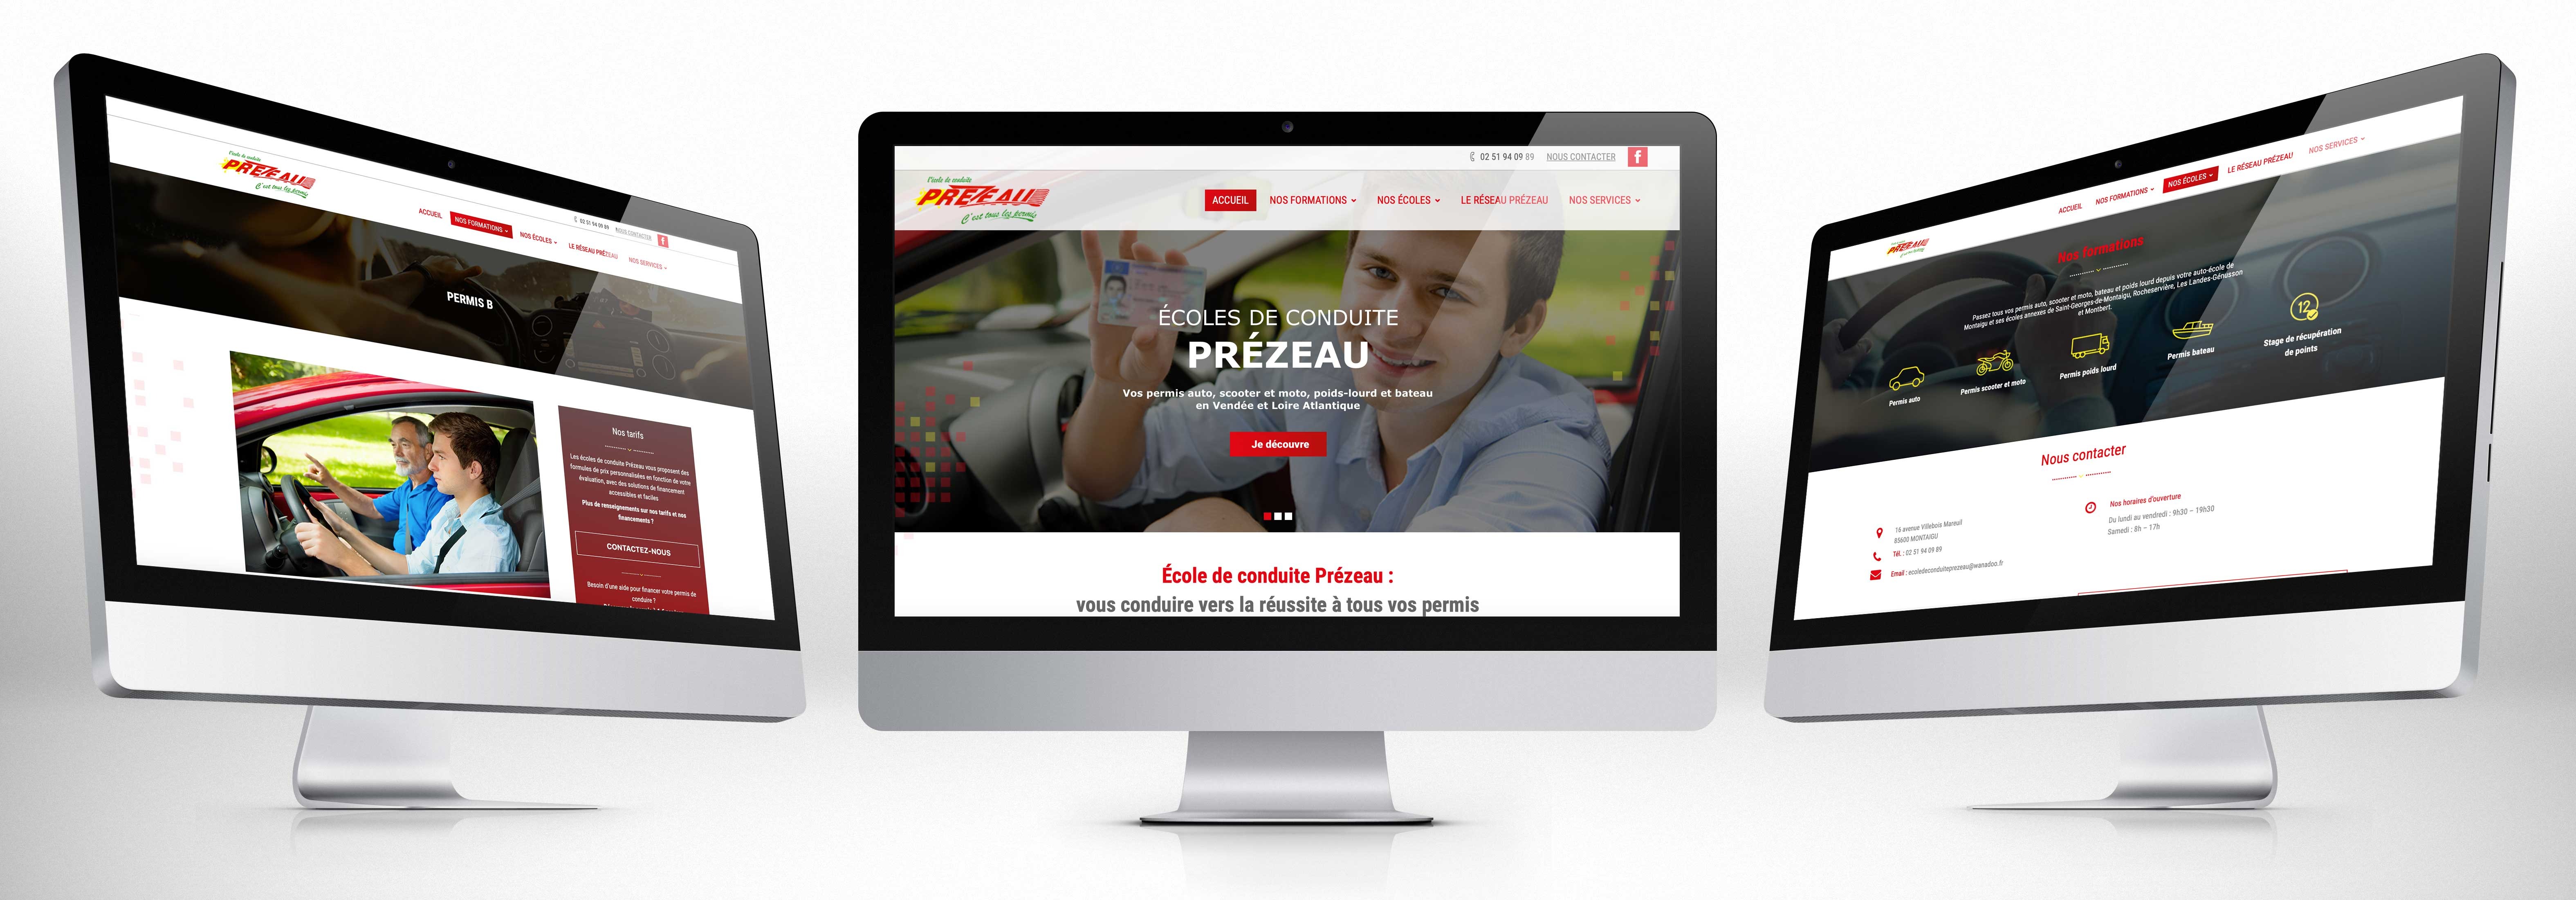 AUTO-ECOLE PREZEAU - SITE WEB Comwell